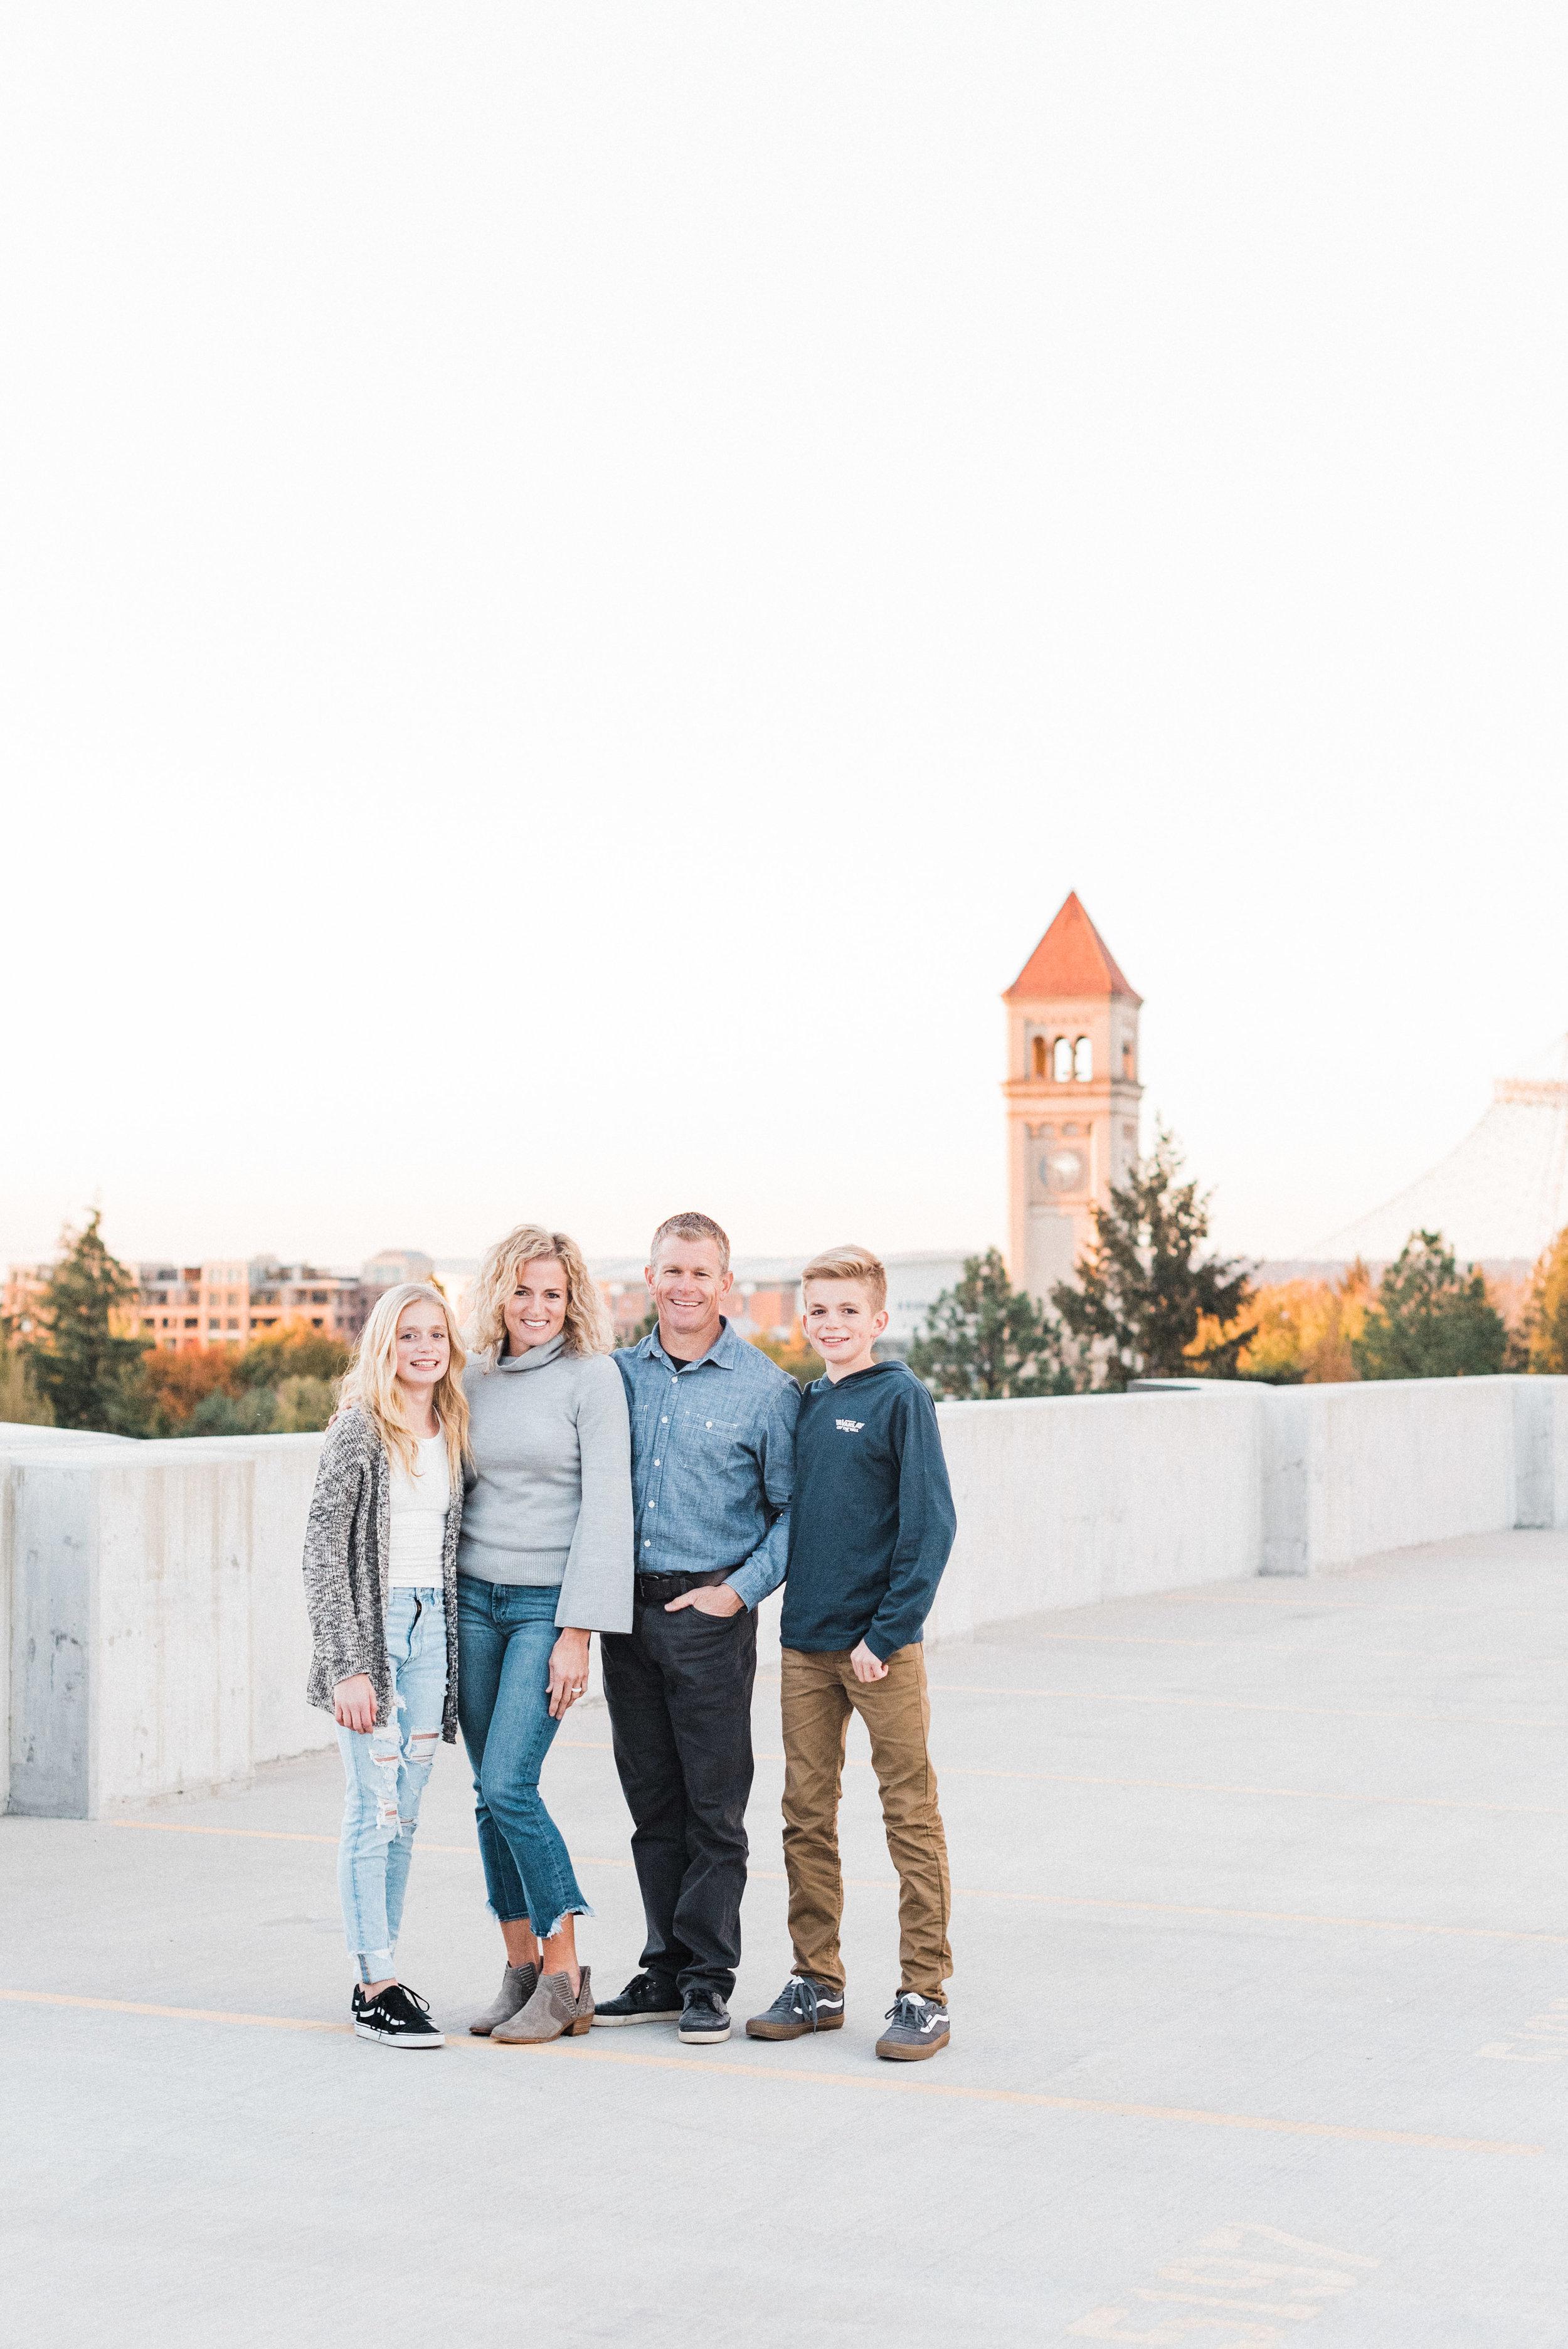 fall-family-session-spokane-wa-cardon (25 of 30).jpg